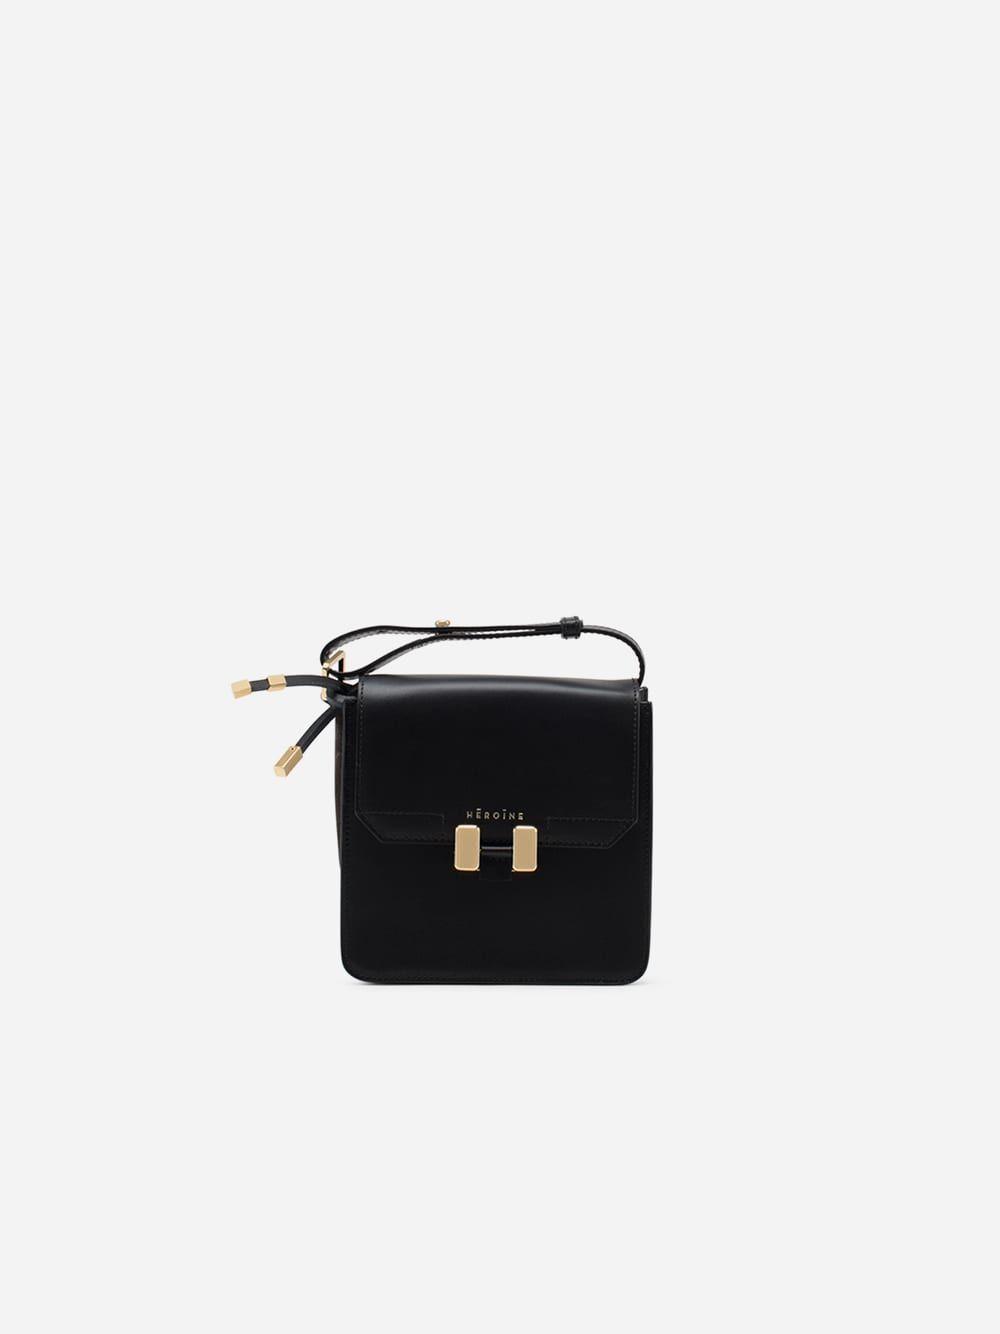 Tilda Black Crossbody Smartphone | Maison Héroïne